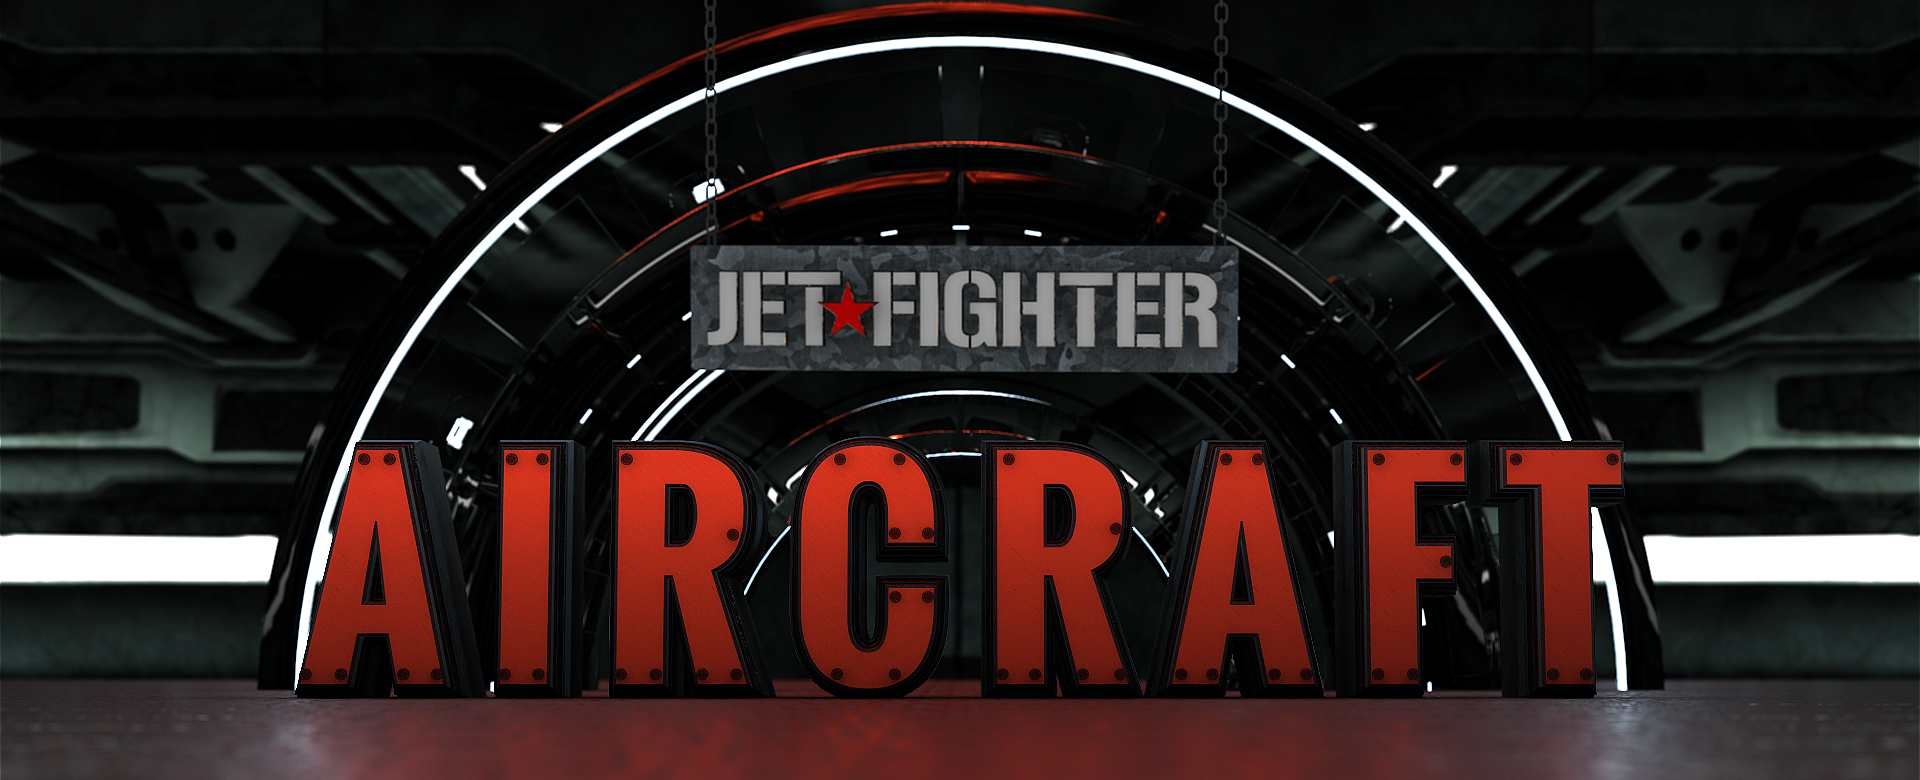 Jet Fighter Aircraft: Albatros L39 Fighter Jet & YAK 52TW Warbird. Adventure Flight, Adrenaline Flight & Scenic Flights